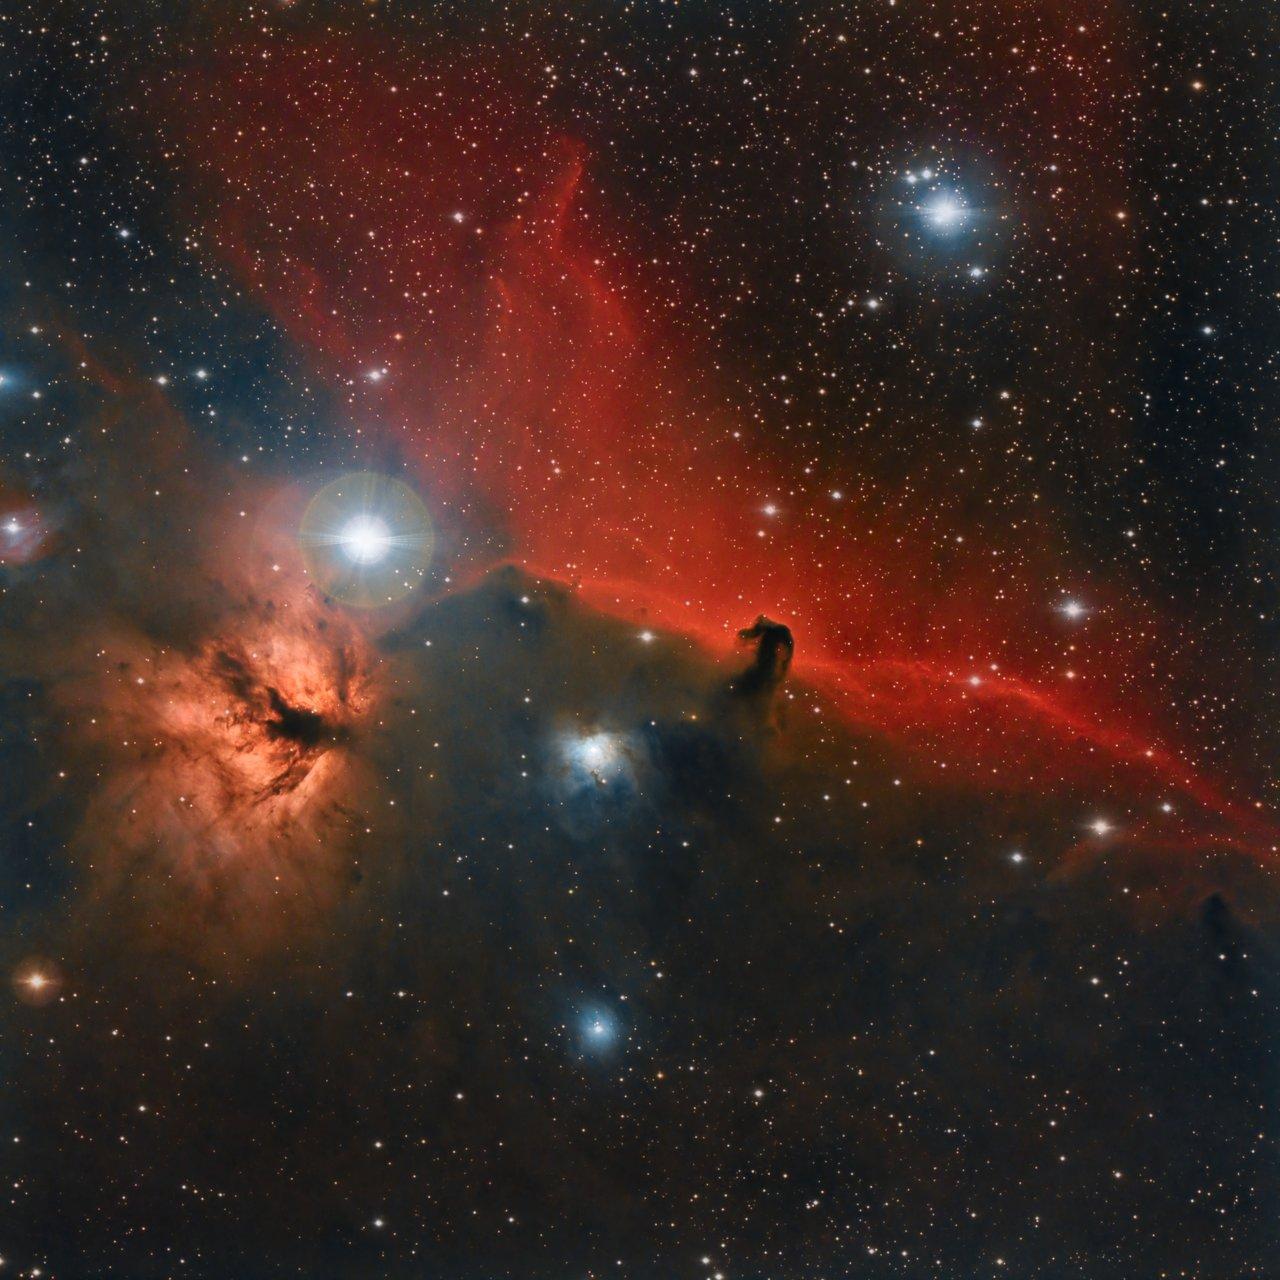 "IC434 - Мъглявината ""Конска глава"" и NGC 2024 - Мъглявината ""Пламък"" | Author Ivan Raichev - sektor | PHOTO FORUM"